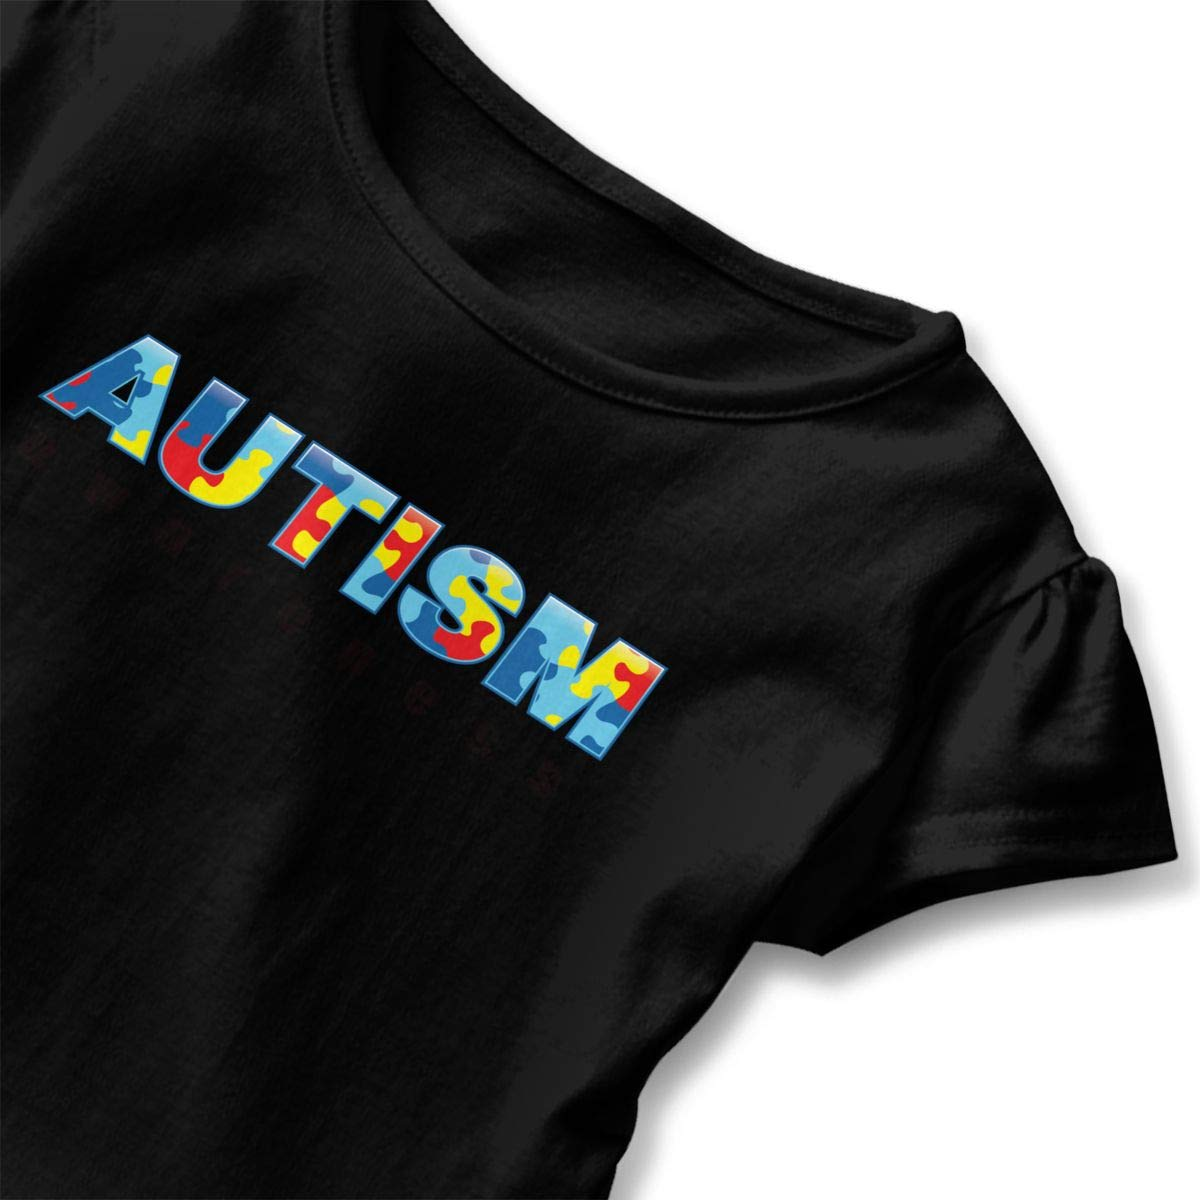 JVNSS Autism Awareness Shirt Fashion Baby Girls Flounced T Shirts Basic Shirt for 2-6T Baby Girls